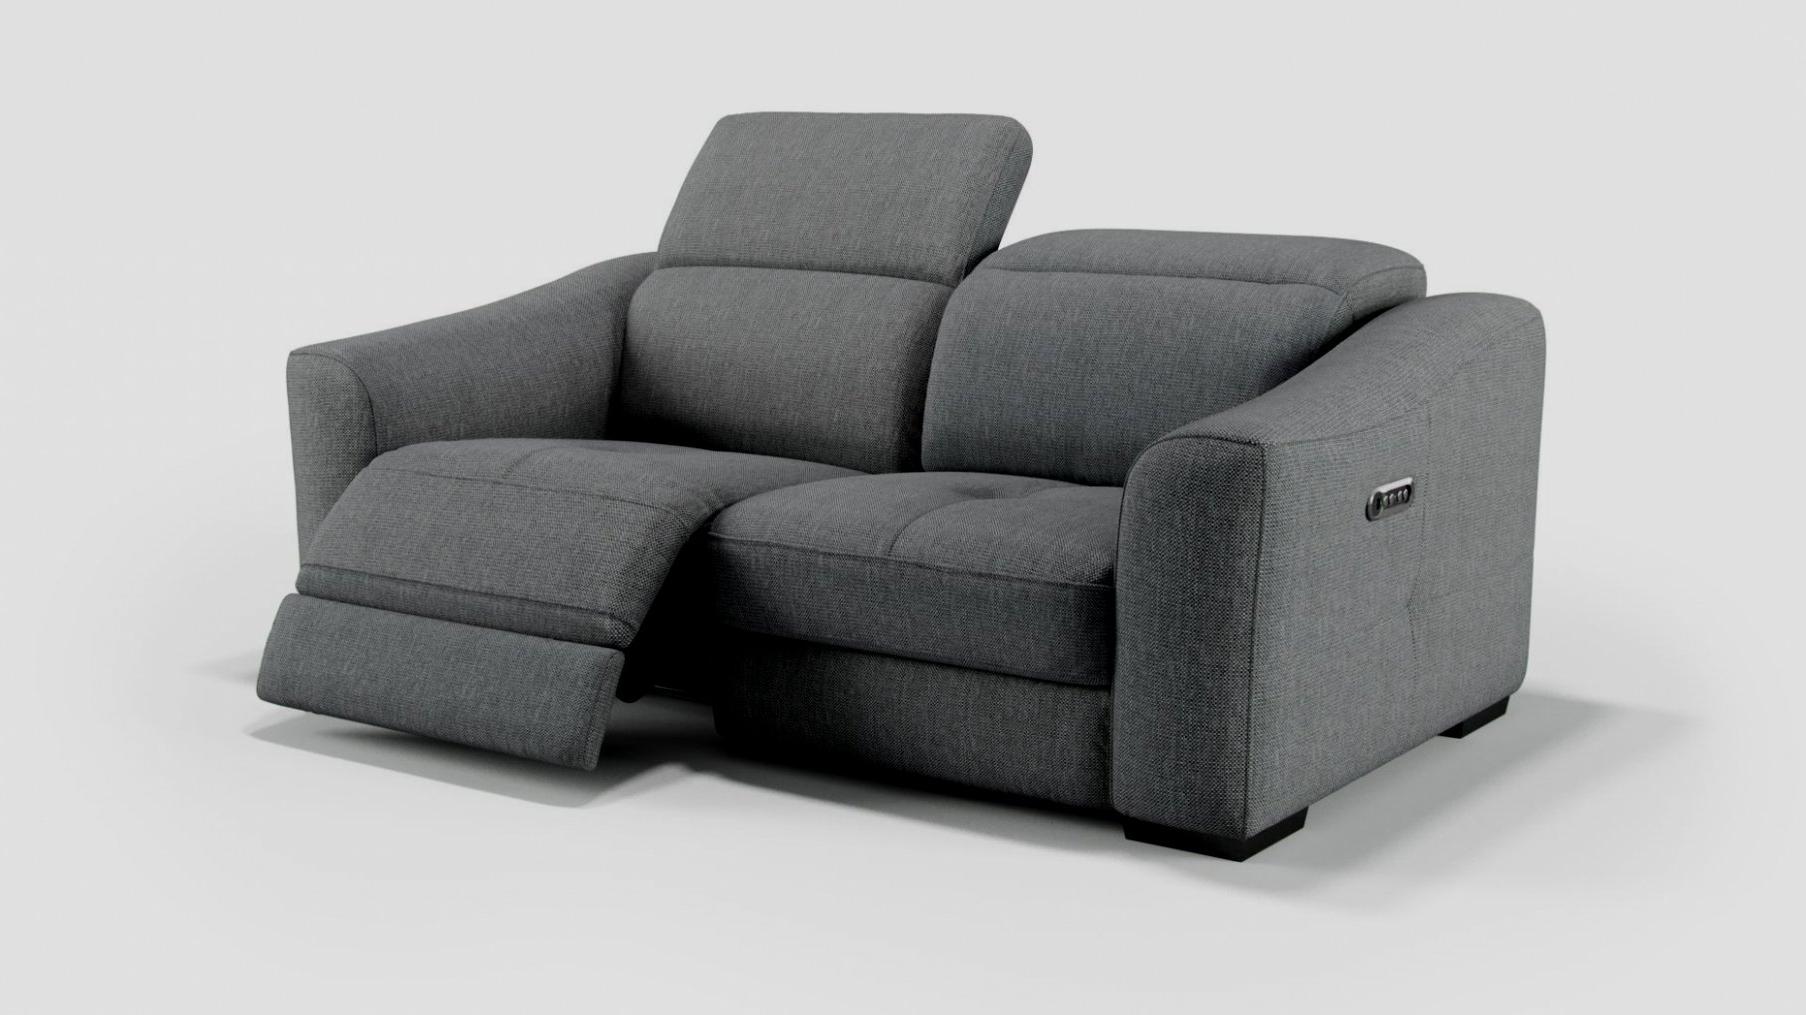 Sofas De Segunda Mano Dddy sofas Segunda Mano Mallorca Bien 2 Sitzer sofa Zum Ausziehen Yct